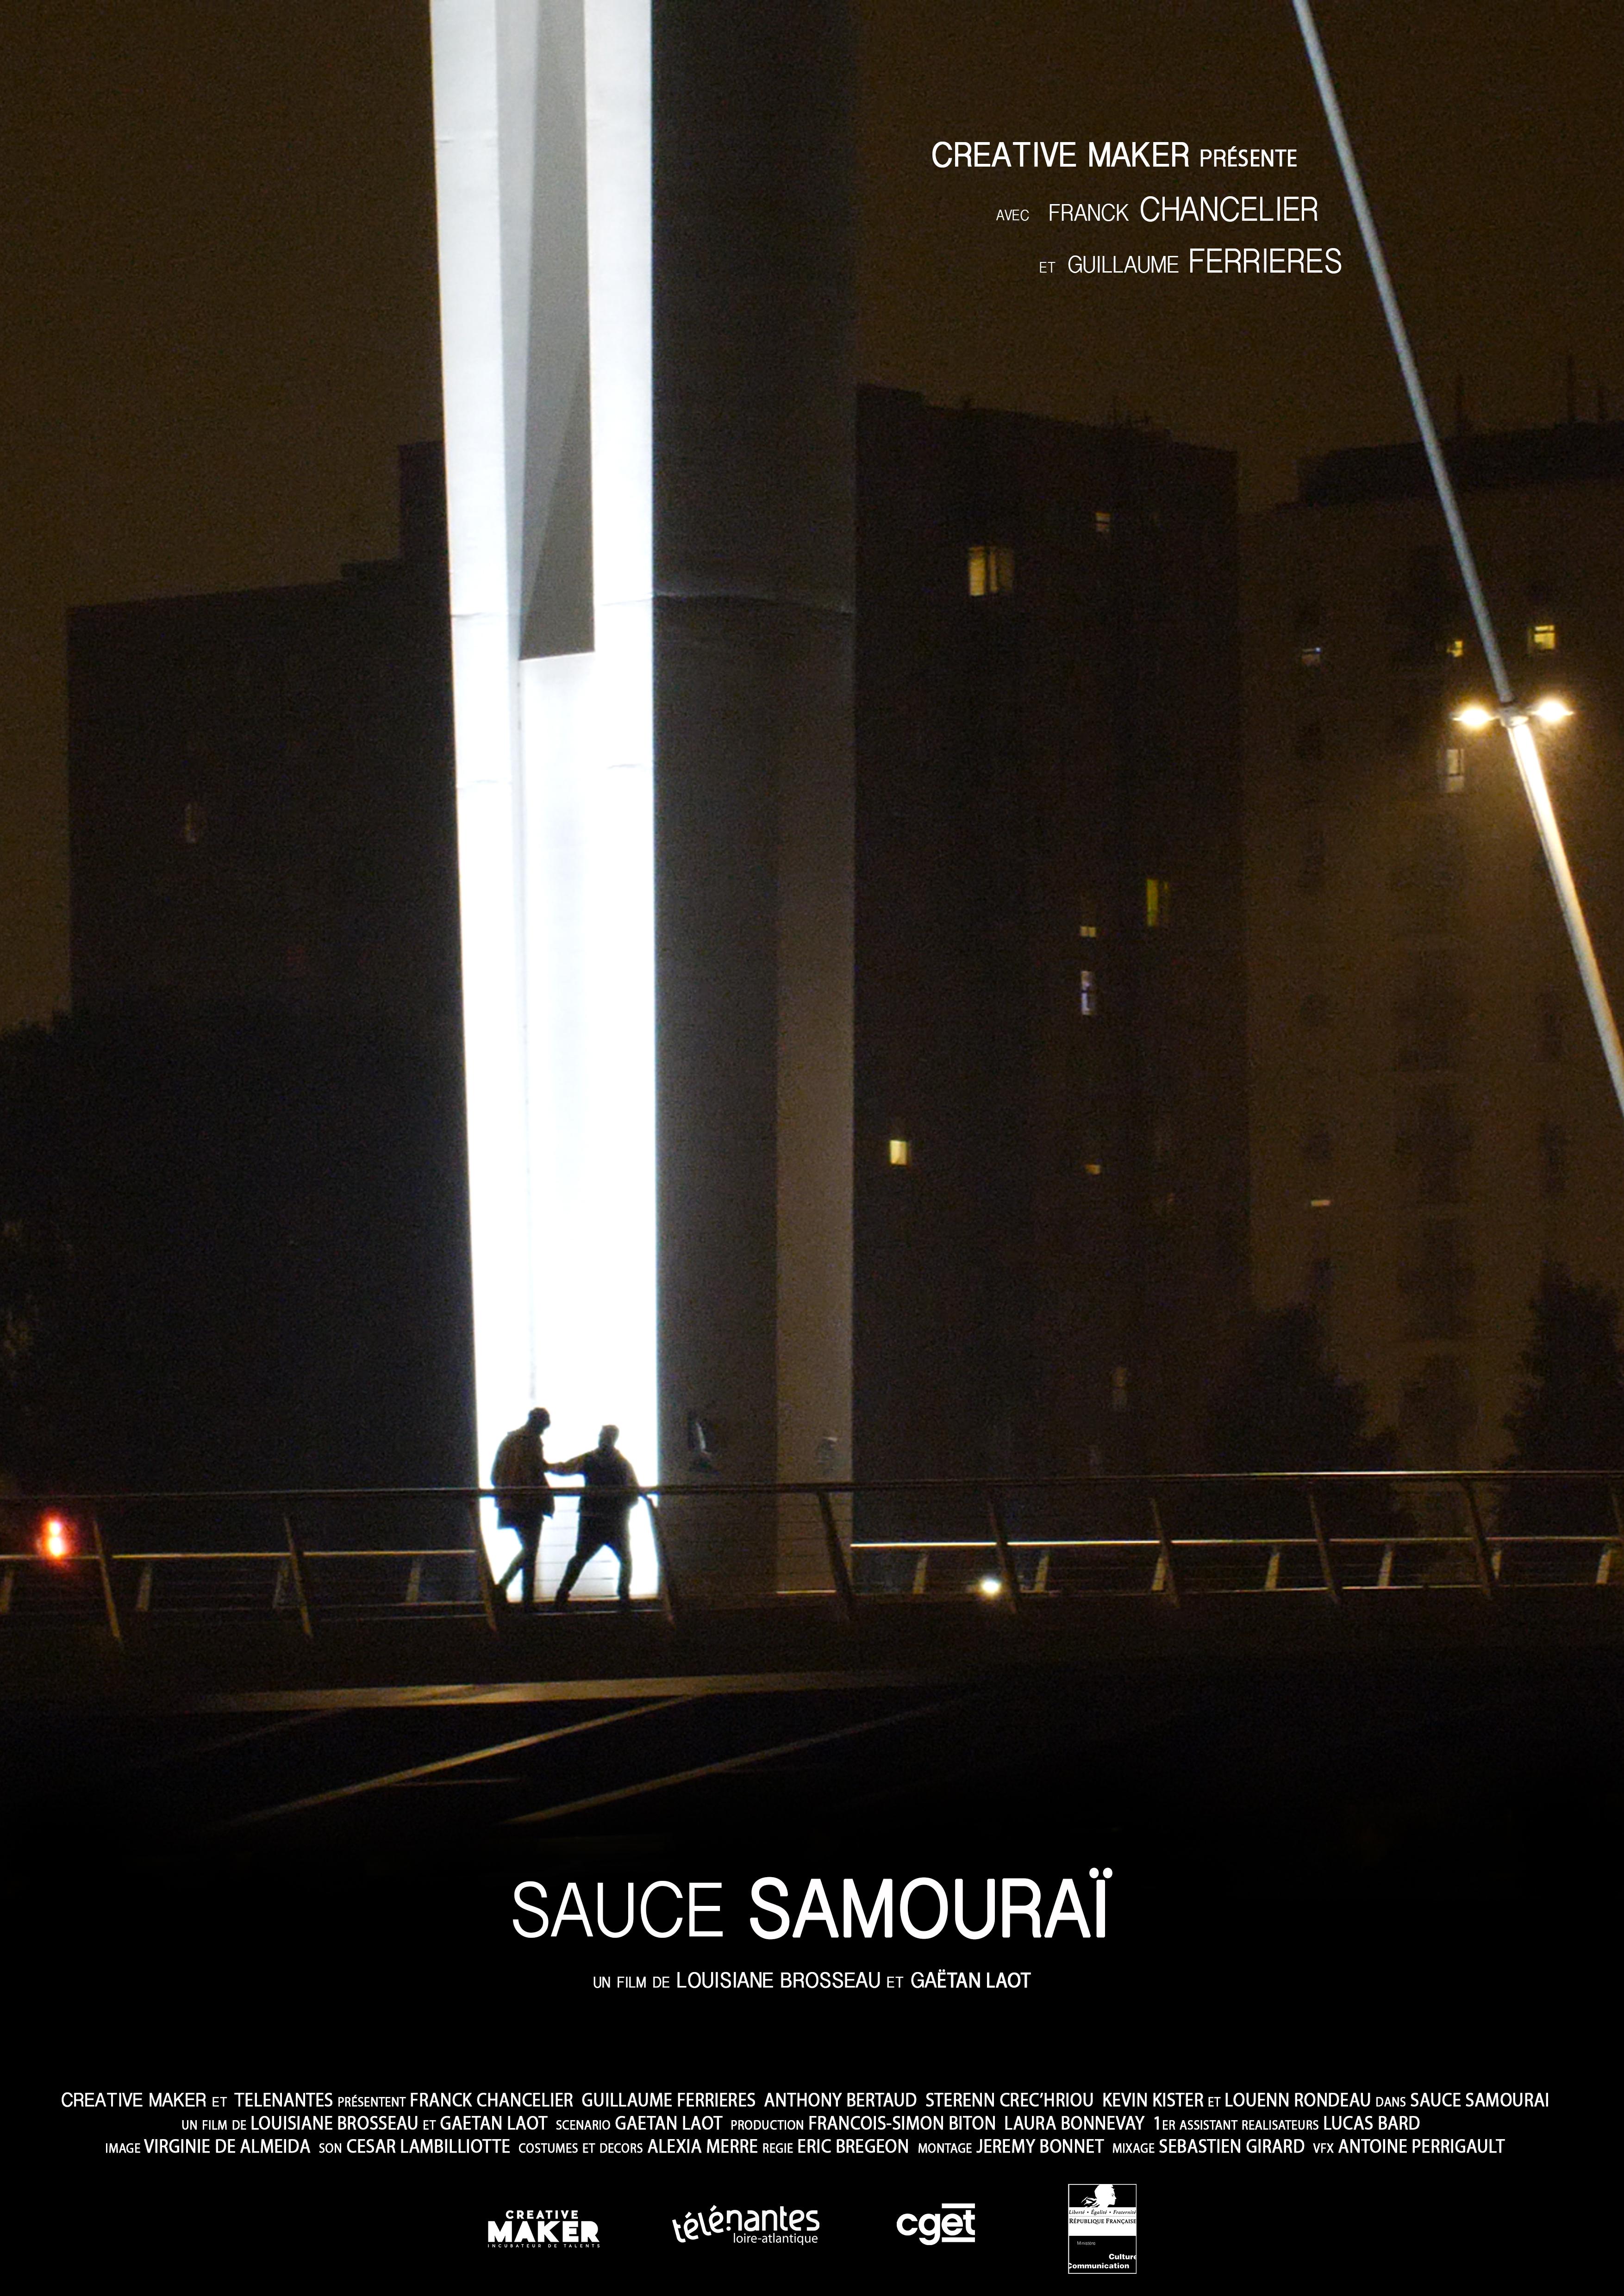 Sauce Samouraï - Louisiane Brosseau et Gaëtan Laot